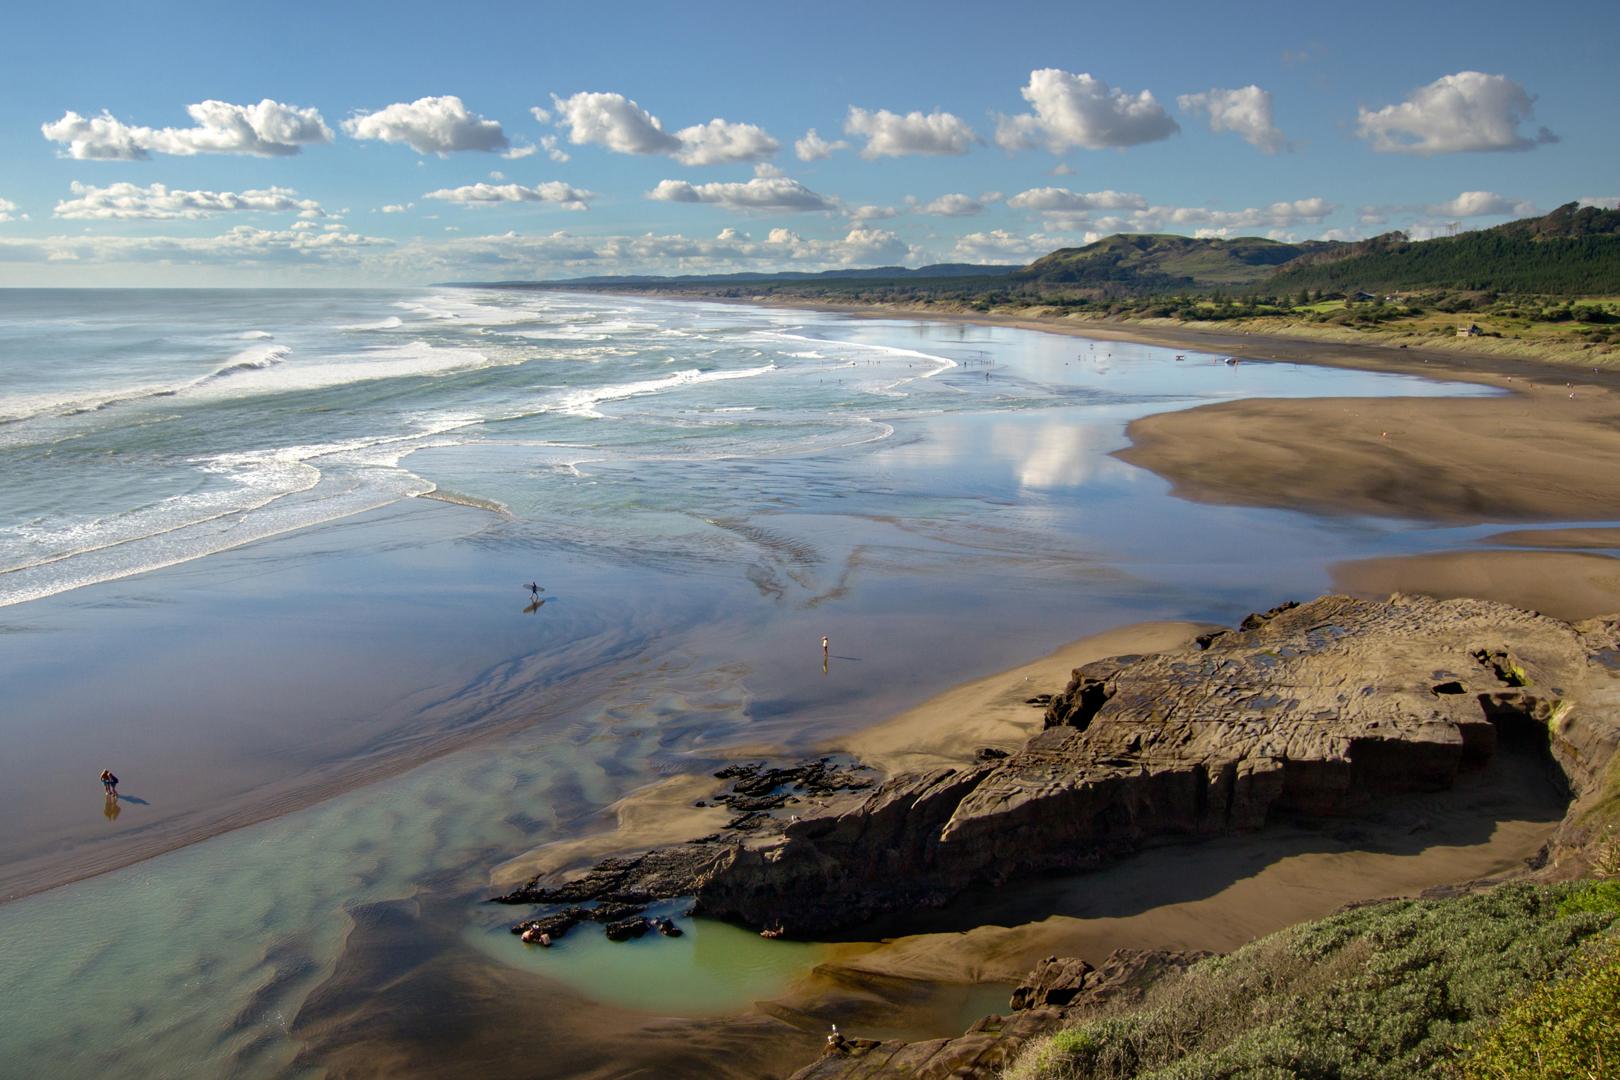 Low tide at Muriwai